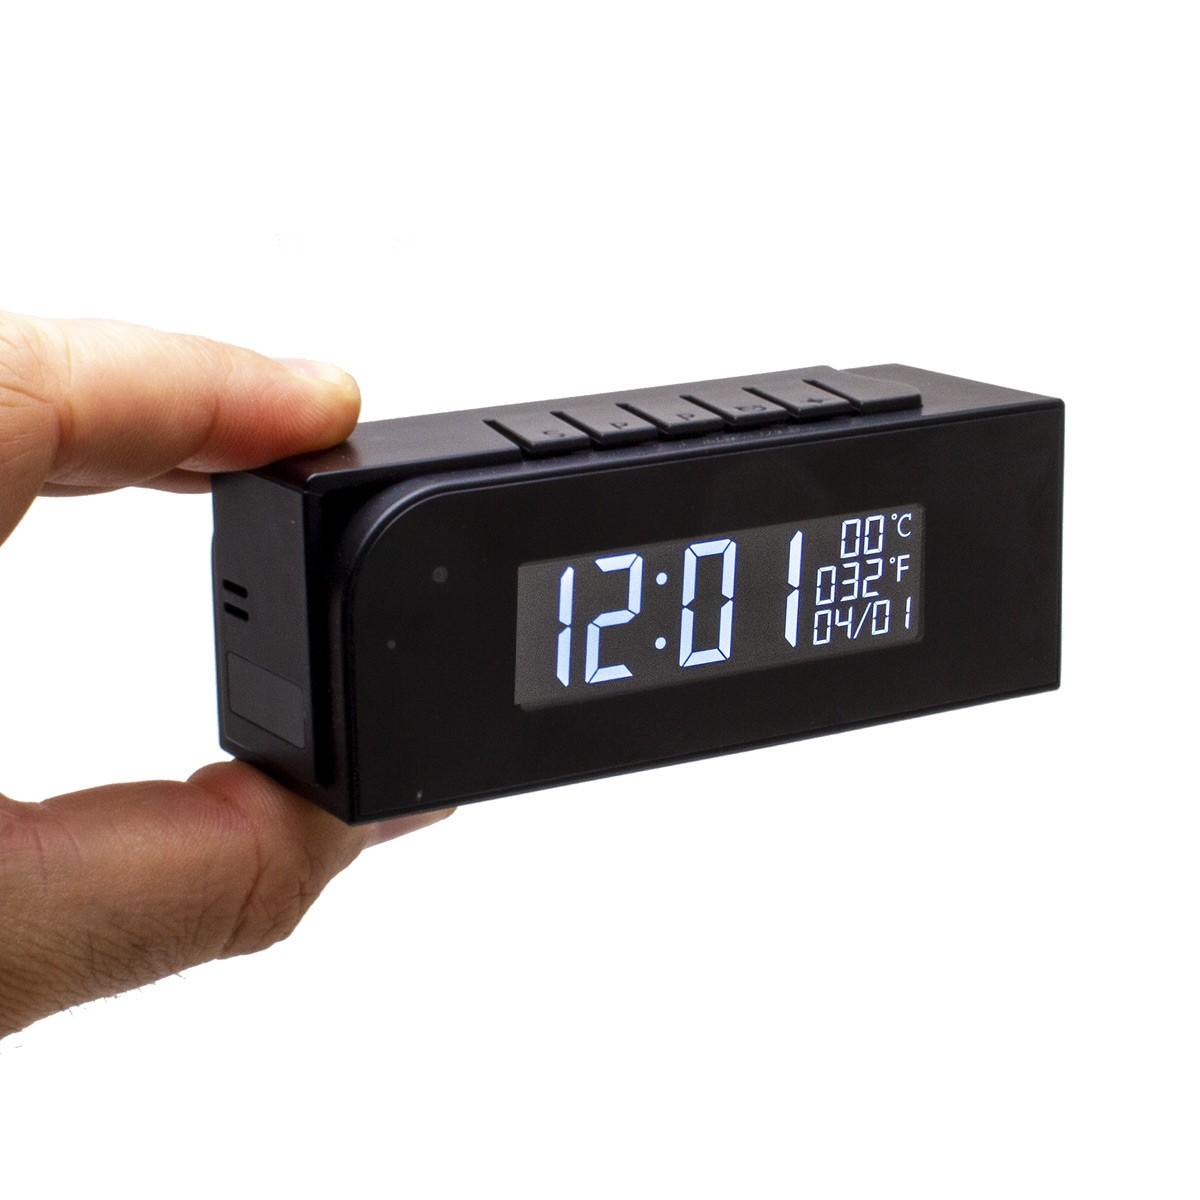 Horloge température de bureau avec micro caméra IP Wi-Fi HD avec vision nocturne microSD 128 Go incluse